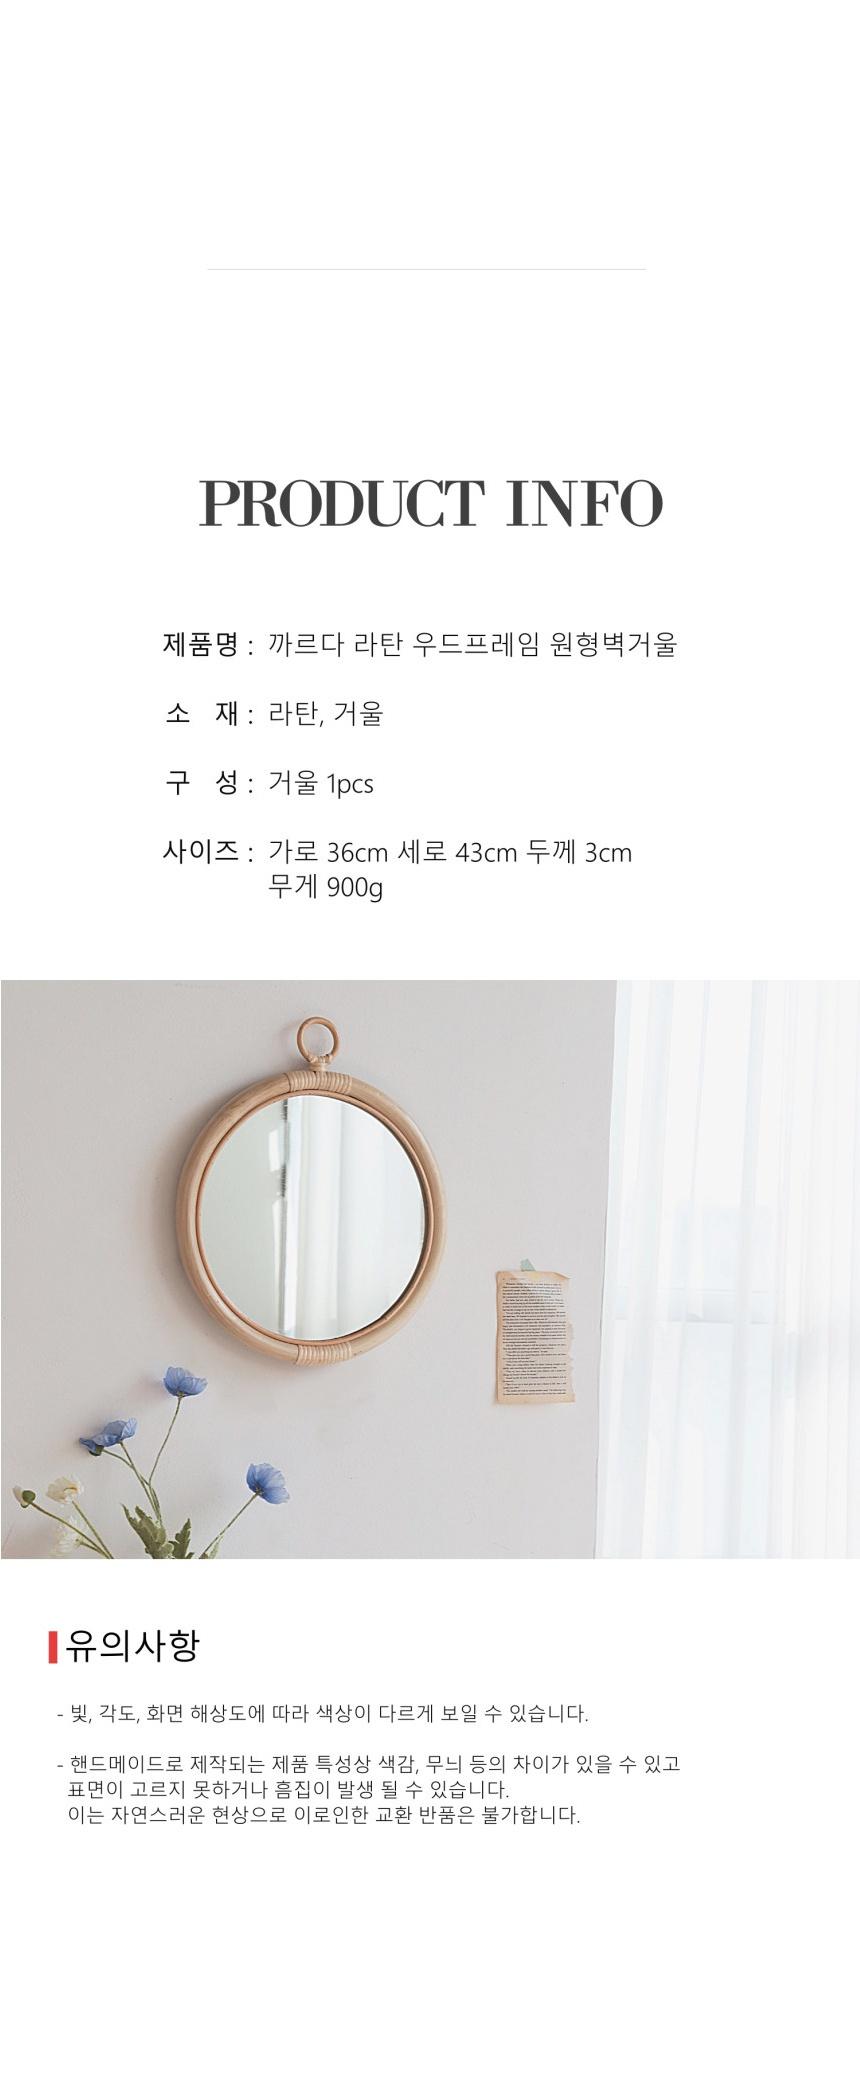 lattan_frame_mirror_05.jpg